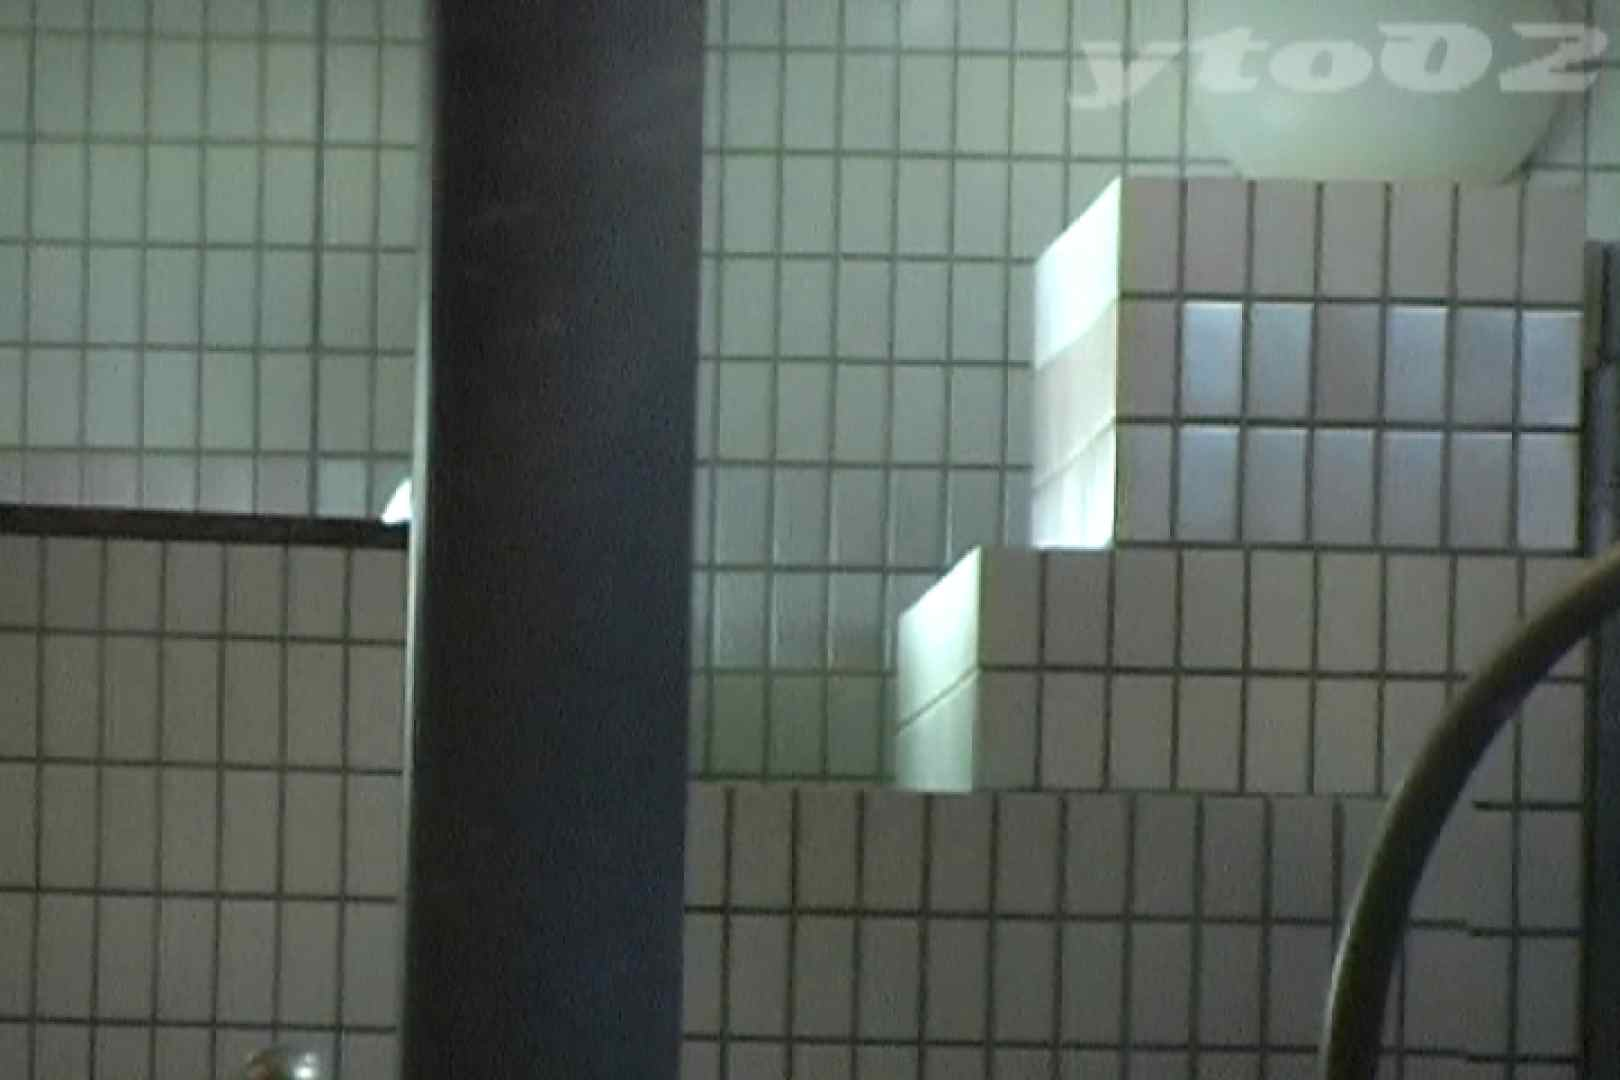 【期間限定配信】合宿ホテル女風呂盗撮 Vol.15 露天丸見え  106画像 56